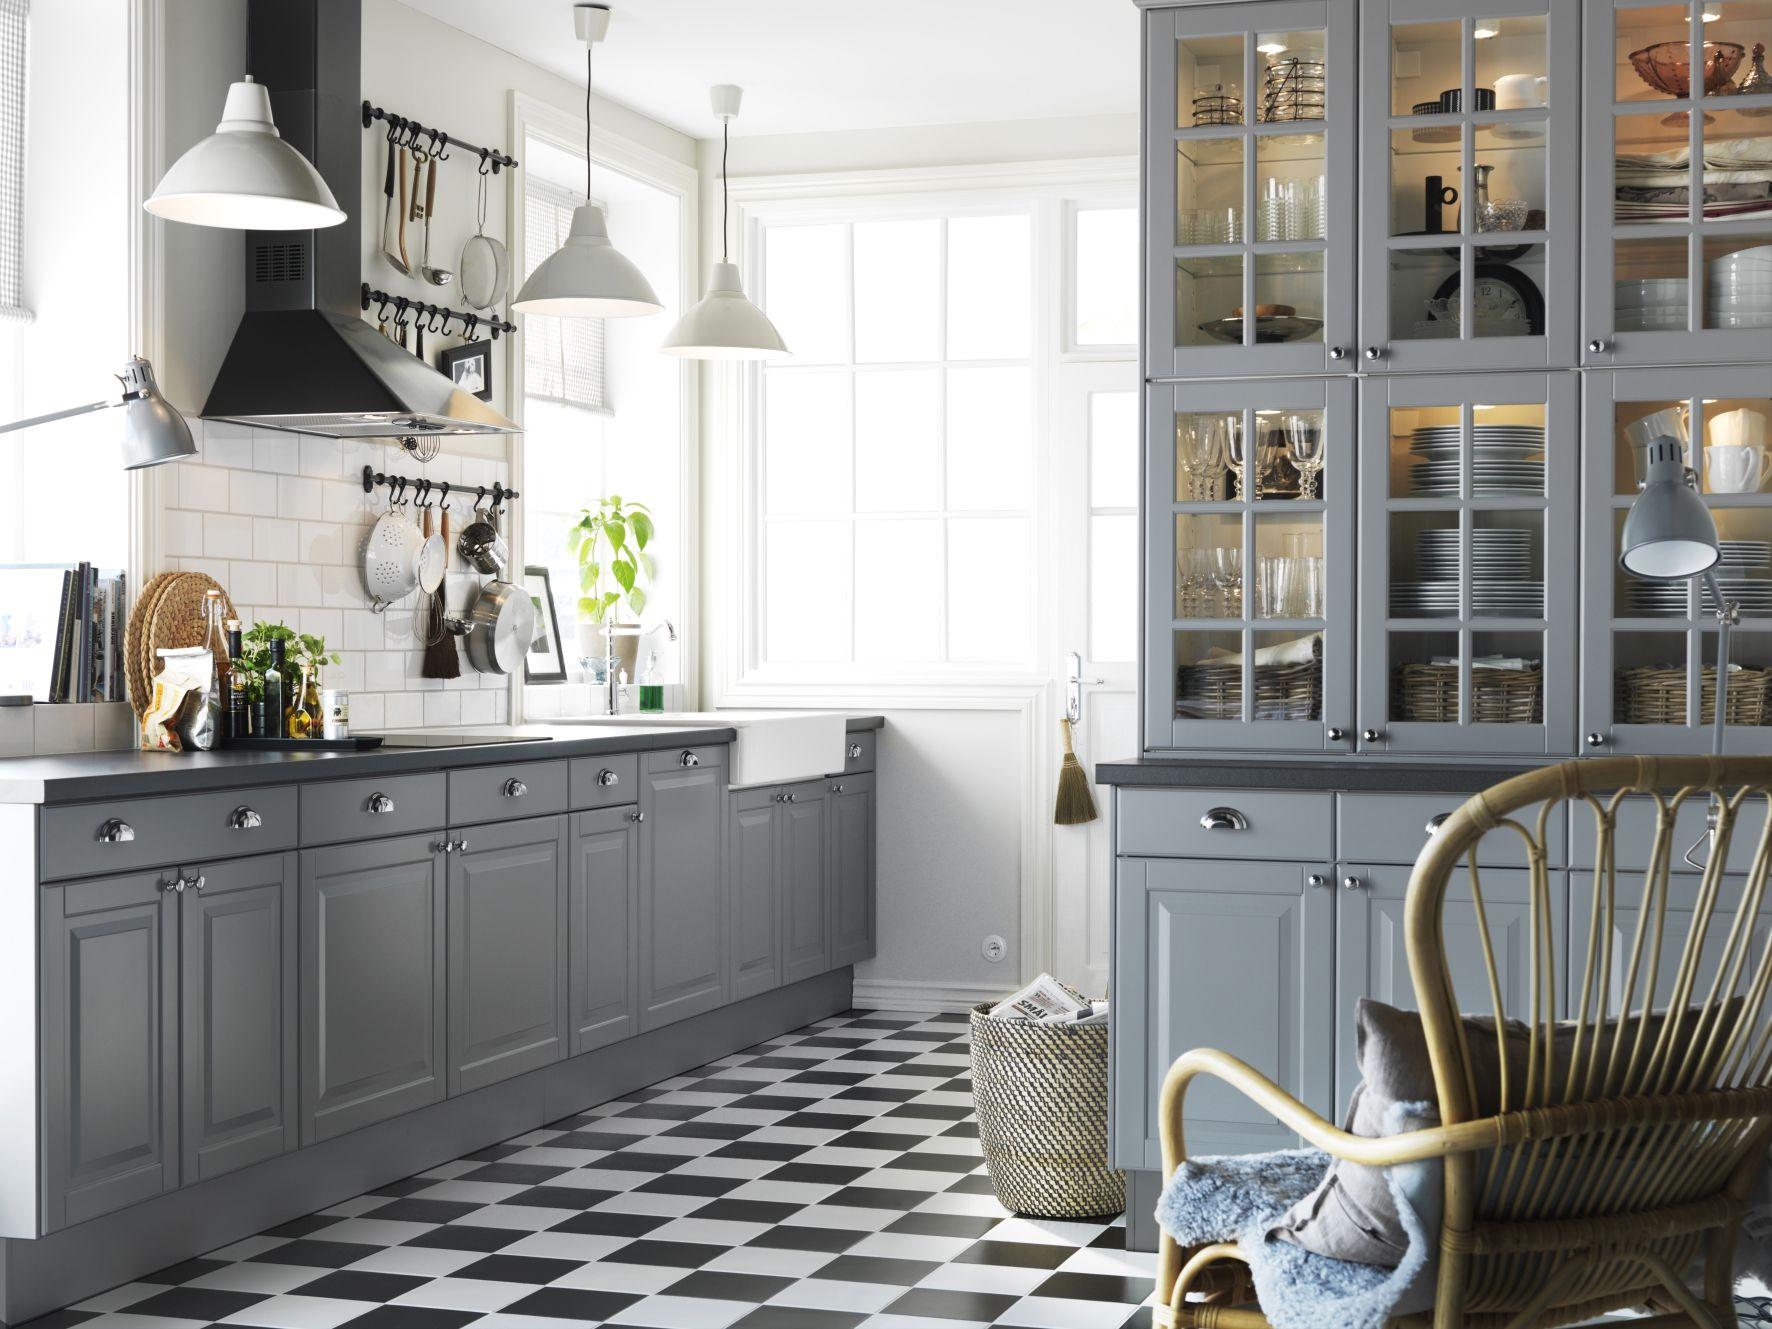 Shop For Furniture Home Accessories More Kok Gratt Kok Golv Ikeakok